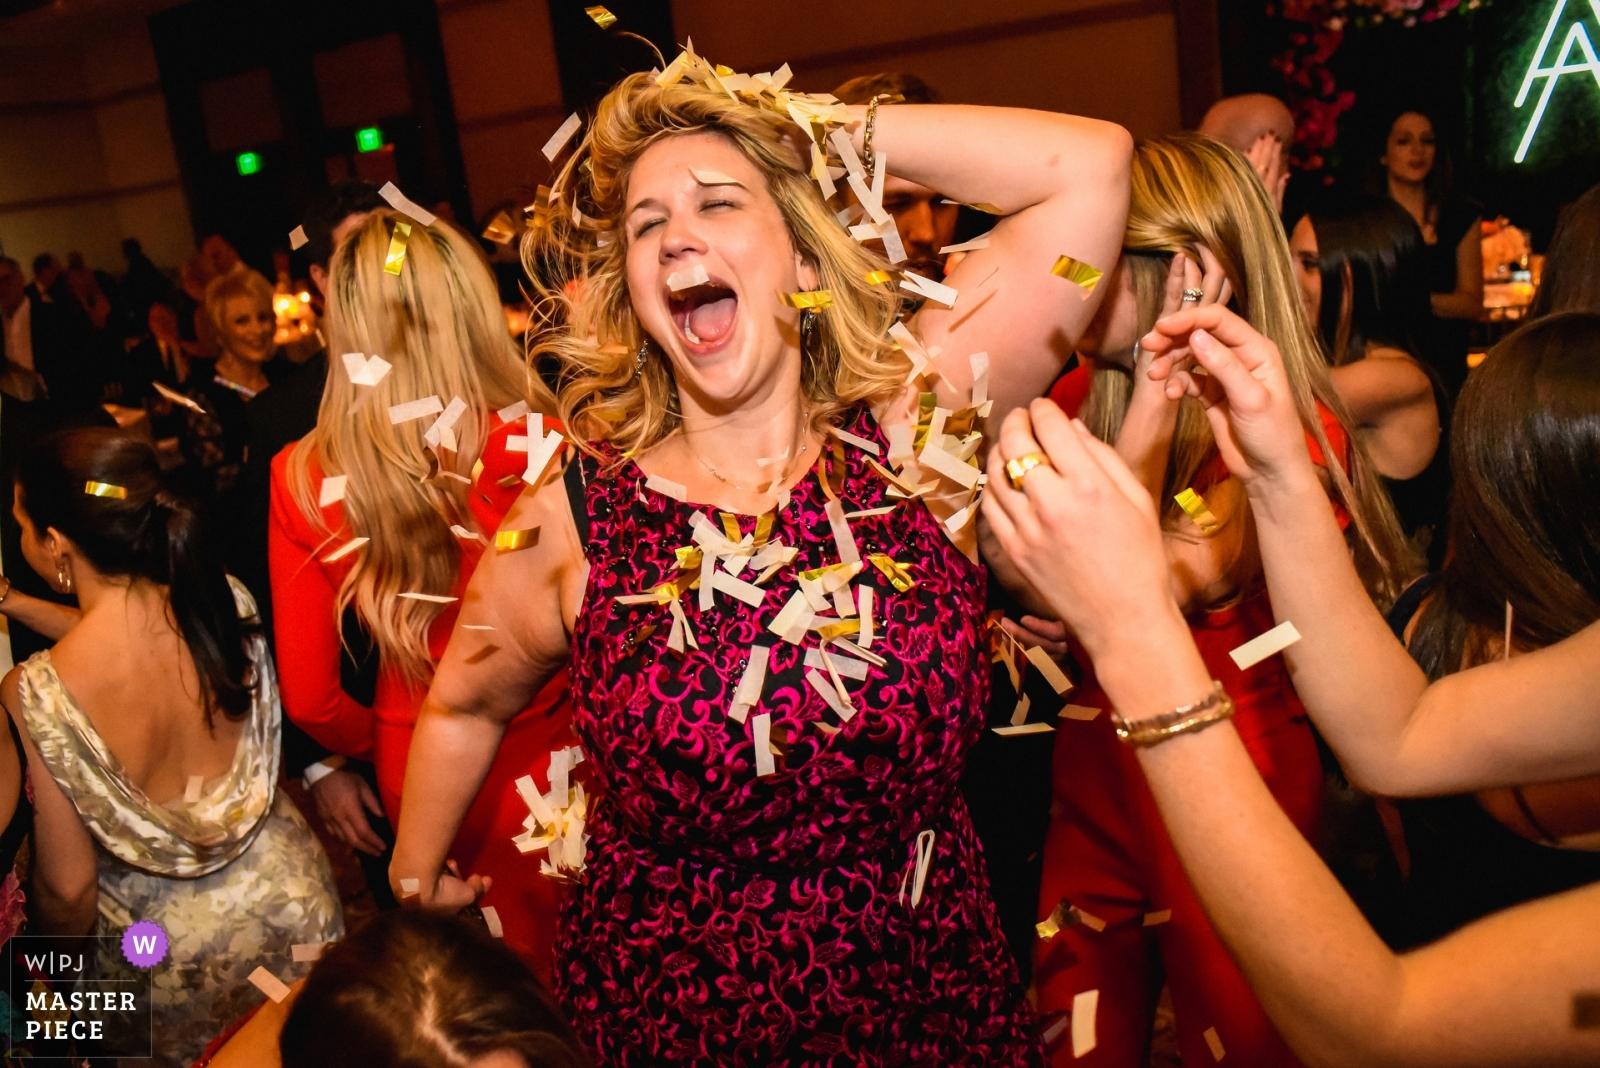 A wedding guests dances on the dance floor - San Diego, California - Southern Wedding Photography -  | The ritz, dove mtn, tucson, AZ